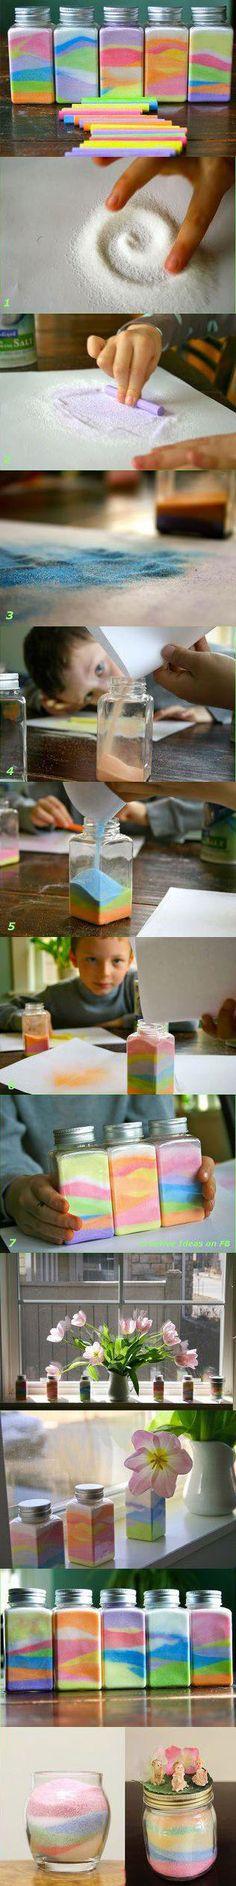 Cool Jar Craft   DIY & Crafts Tutorials